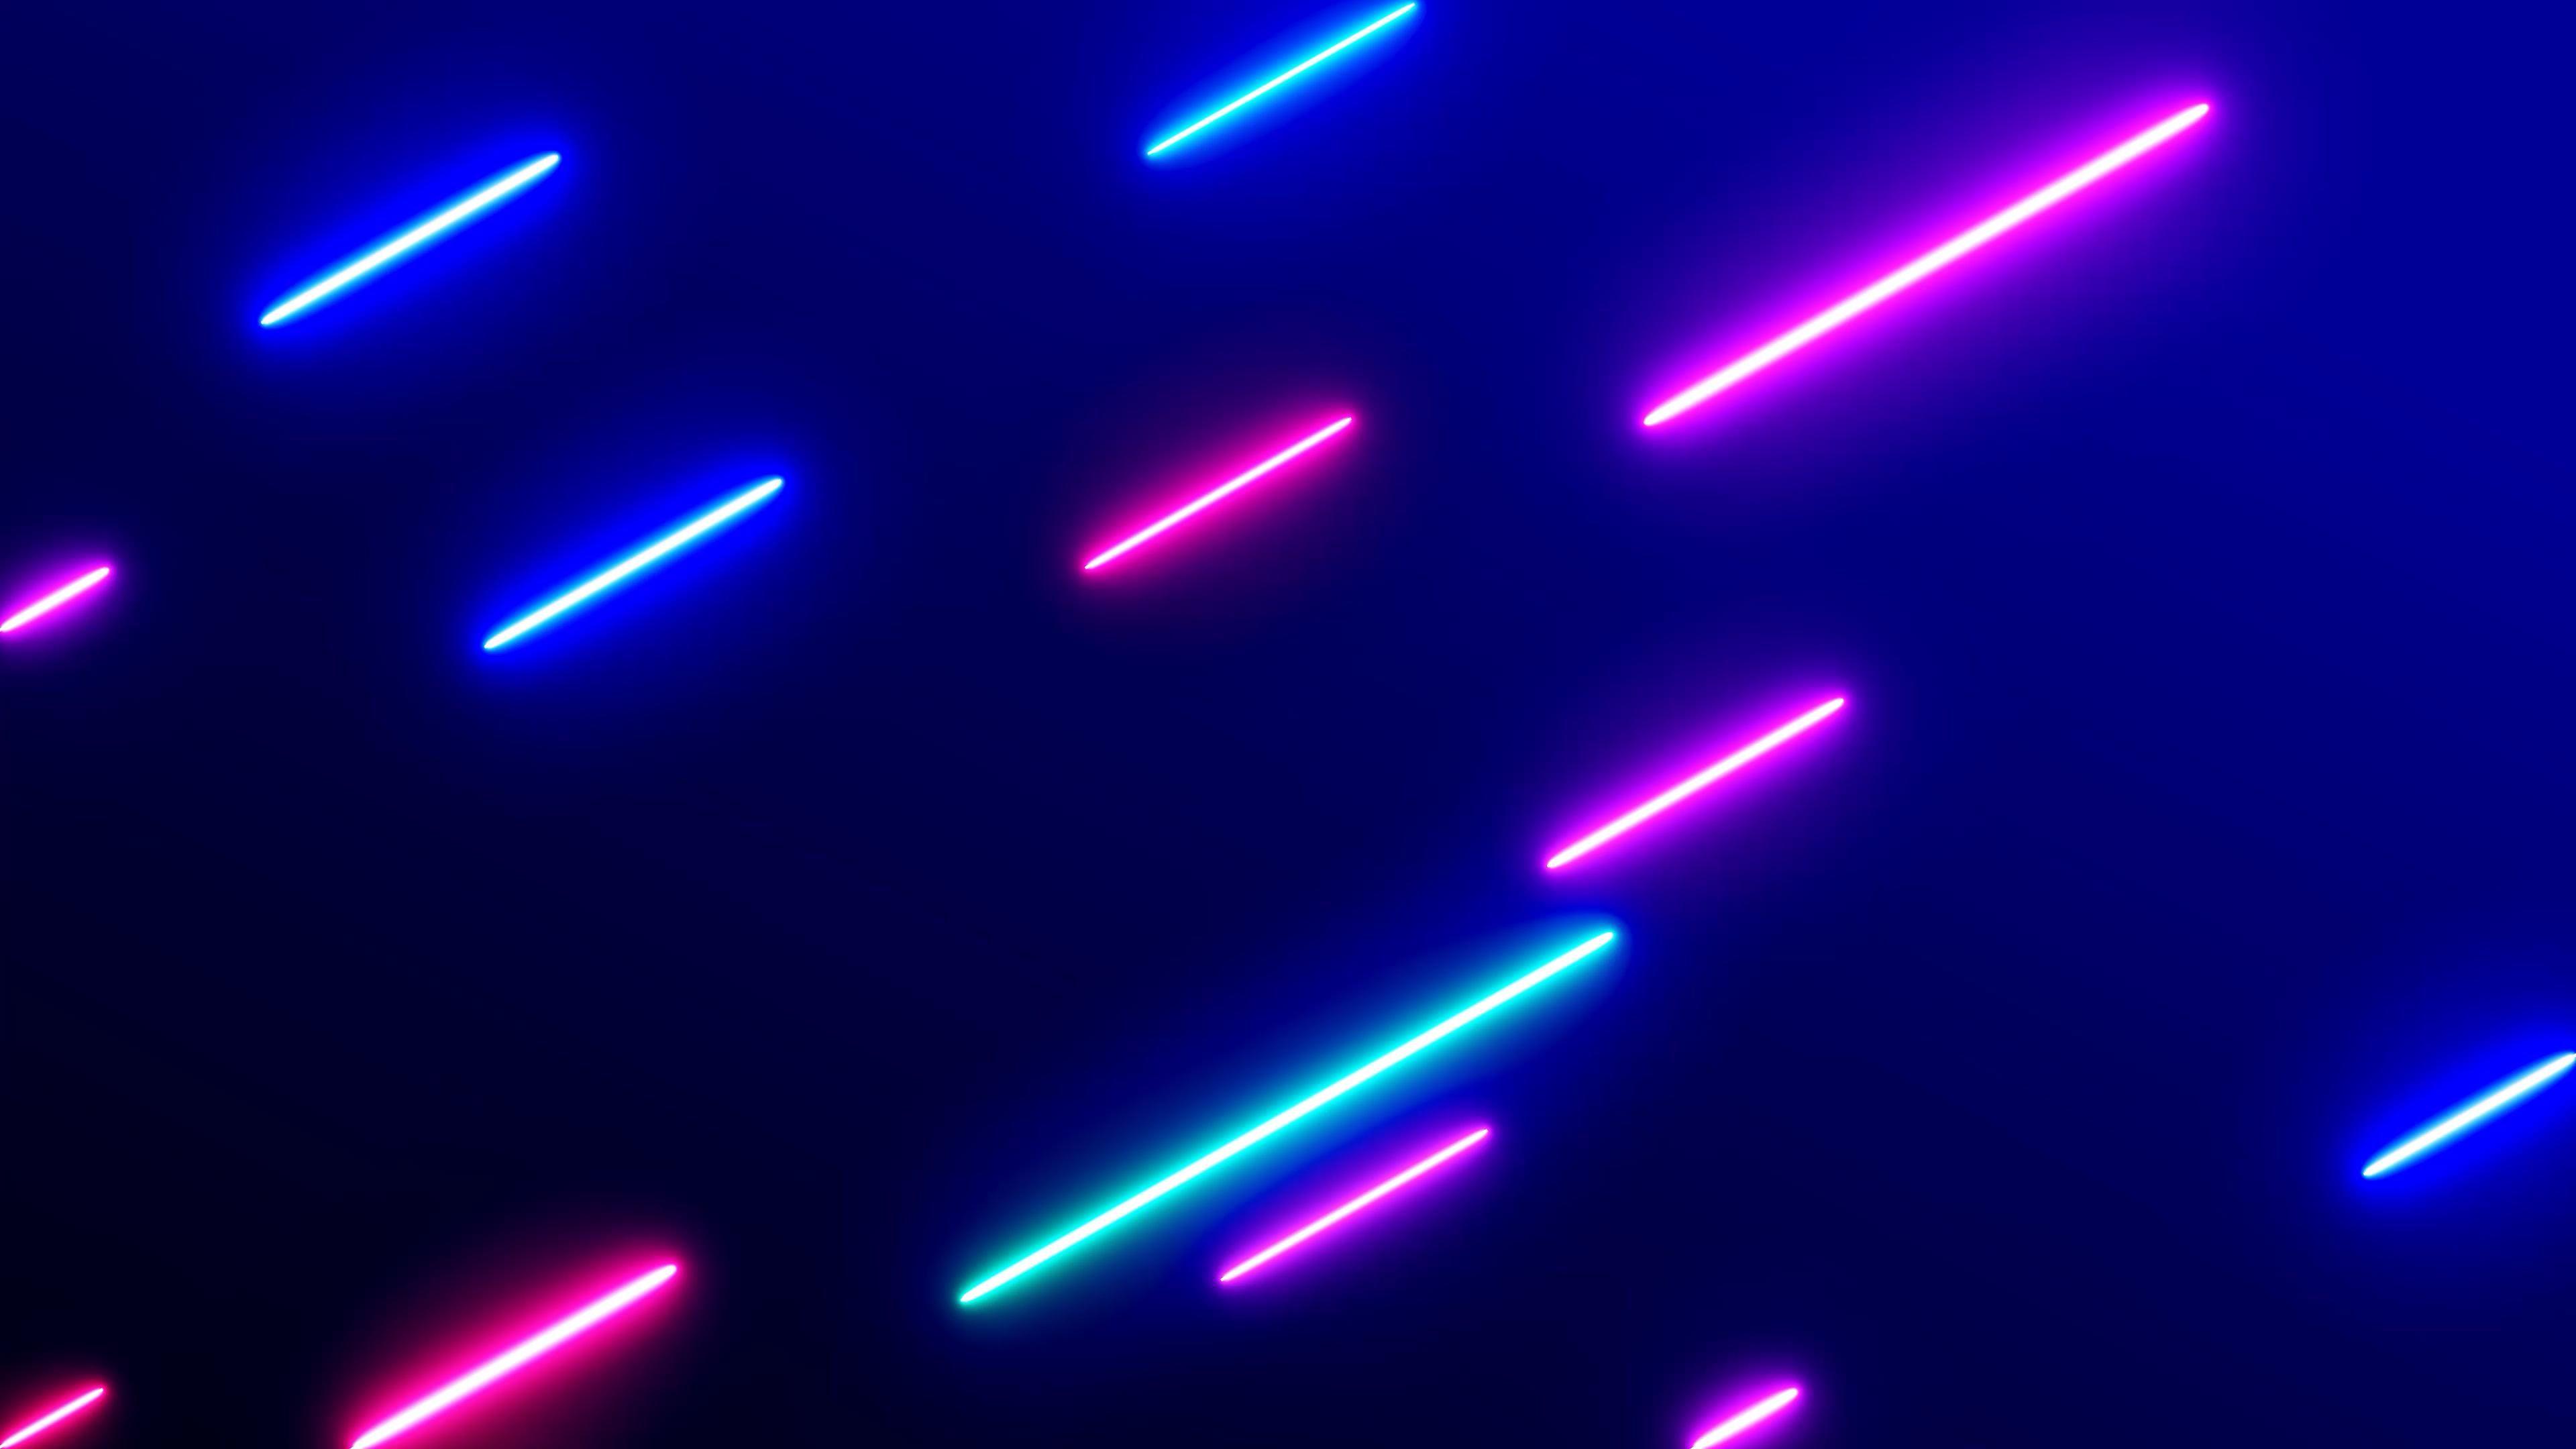 Free Motion Graphic Virtual Background Retro Neon Lights Laser Beams 90s Vj Loop Video Neon Light Wallpaper Neon Wallpaper Neon